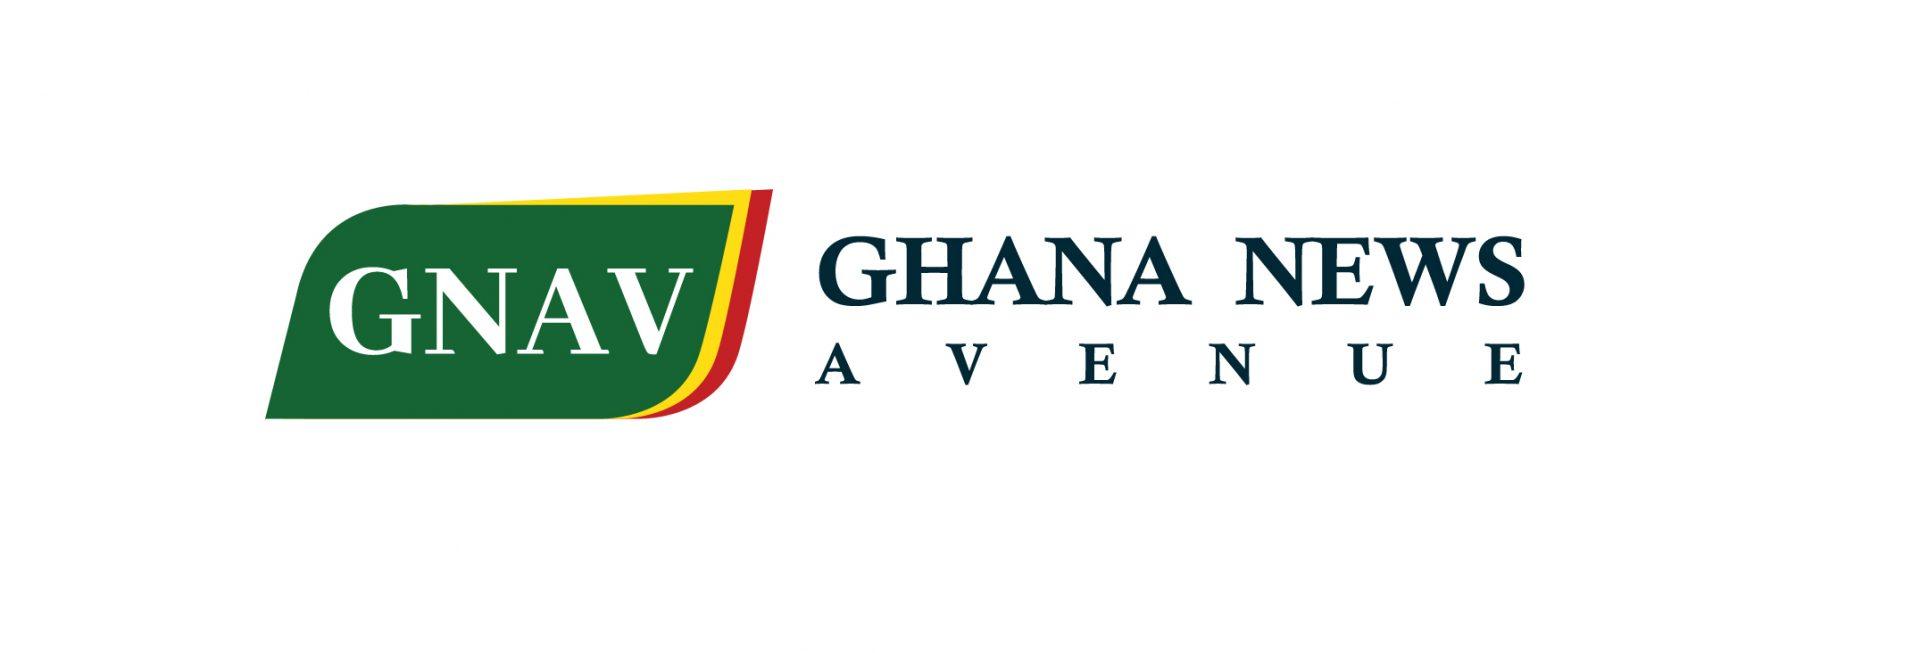 Ghana News Avenue